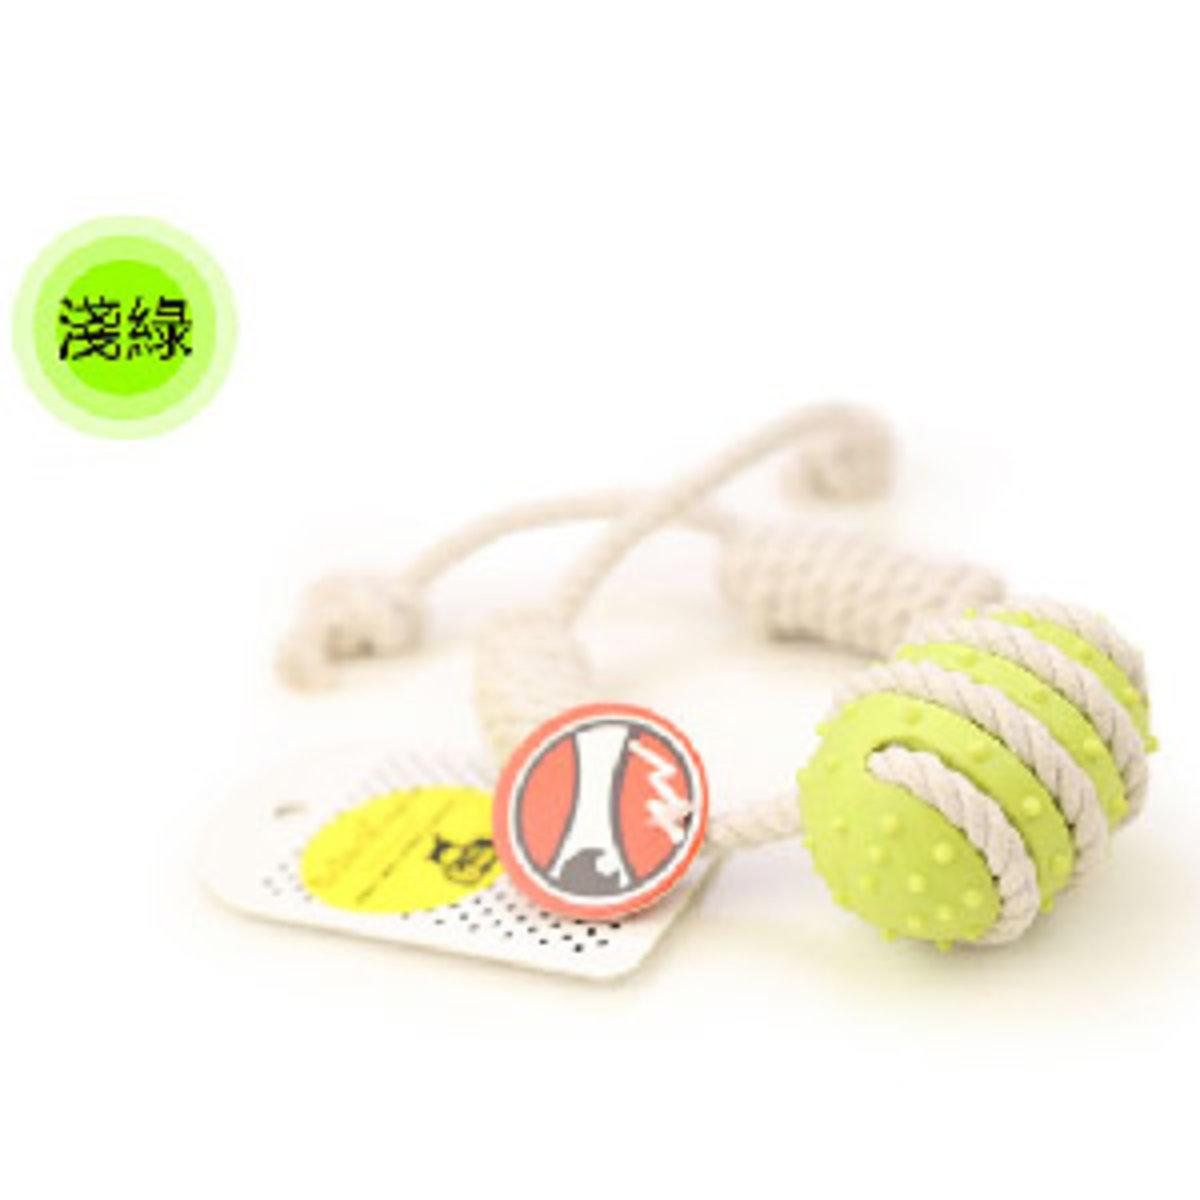 Aduck 棉繩球磨牙狗狗訓練玩具 (淺綠)